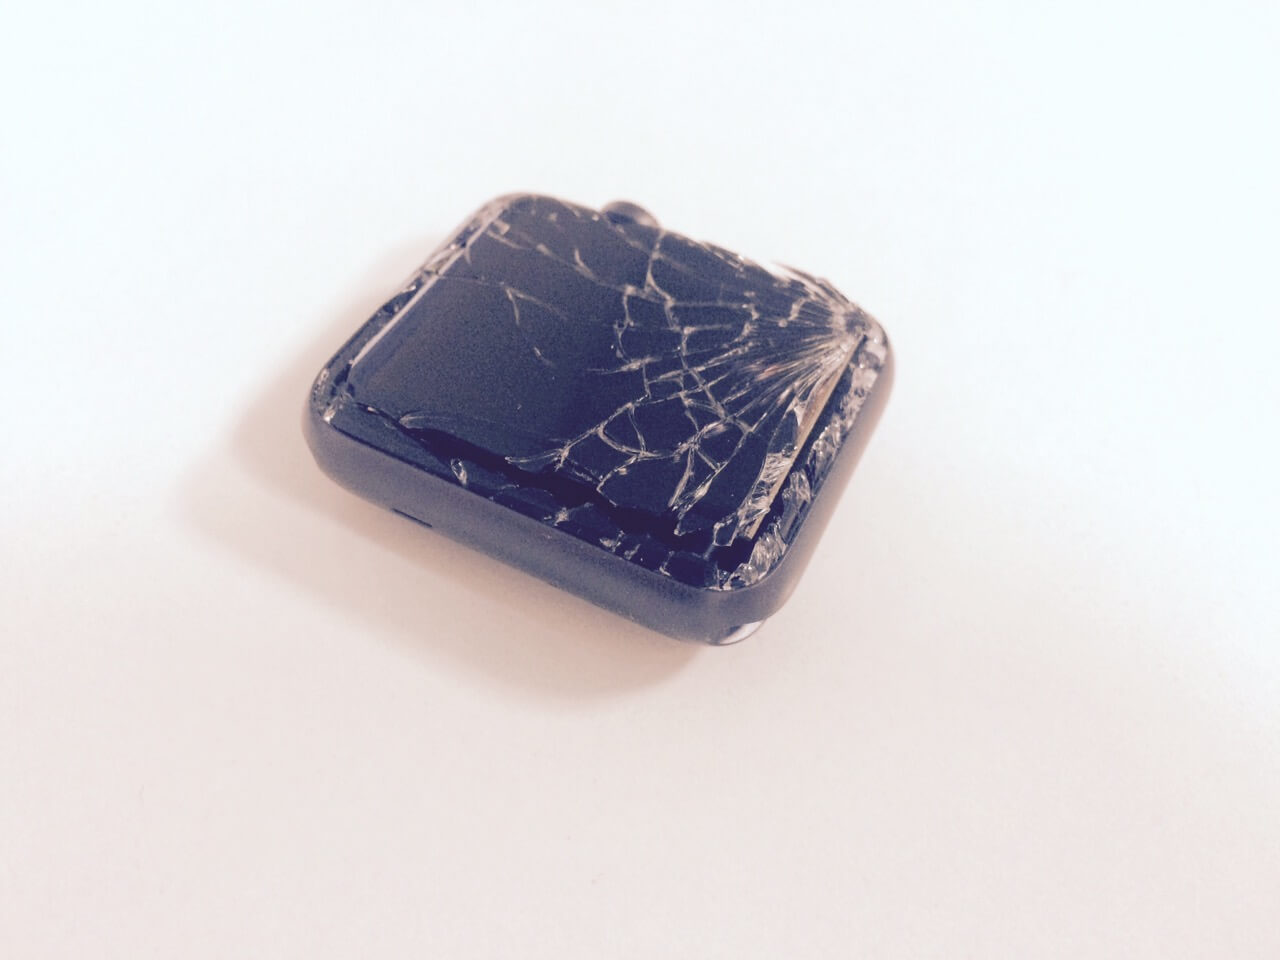 Замена стекла на Эппл Вотч 2